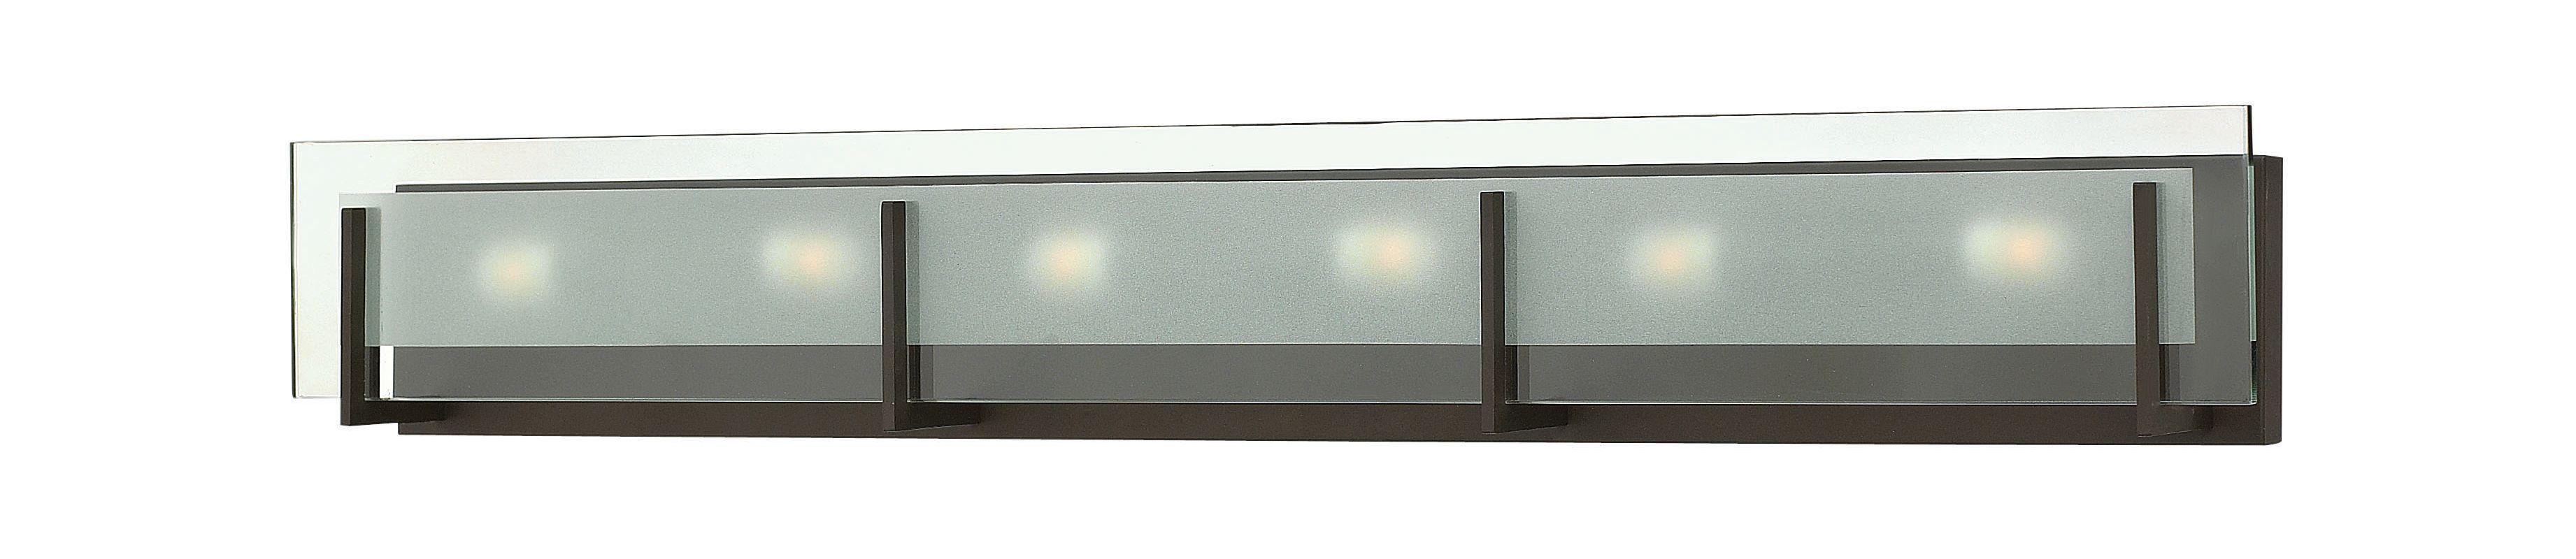 Hinkley Lighting 5656-LED 6 Light ADA Compliant LED Bath Bar from the Sale $679.00 ITEM#: 2635600 MODEL# :5656OZ-LED UPC#: 640665565676 :